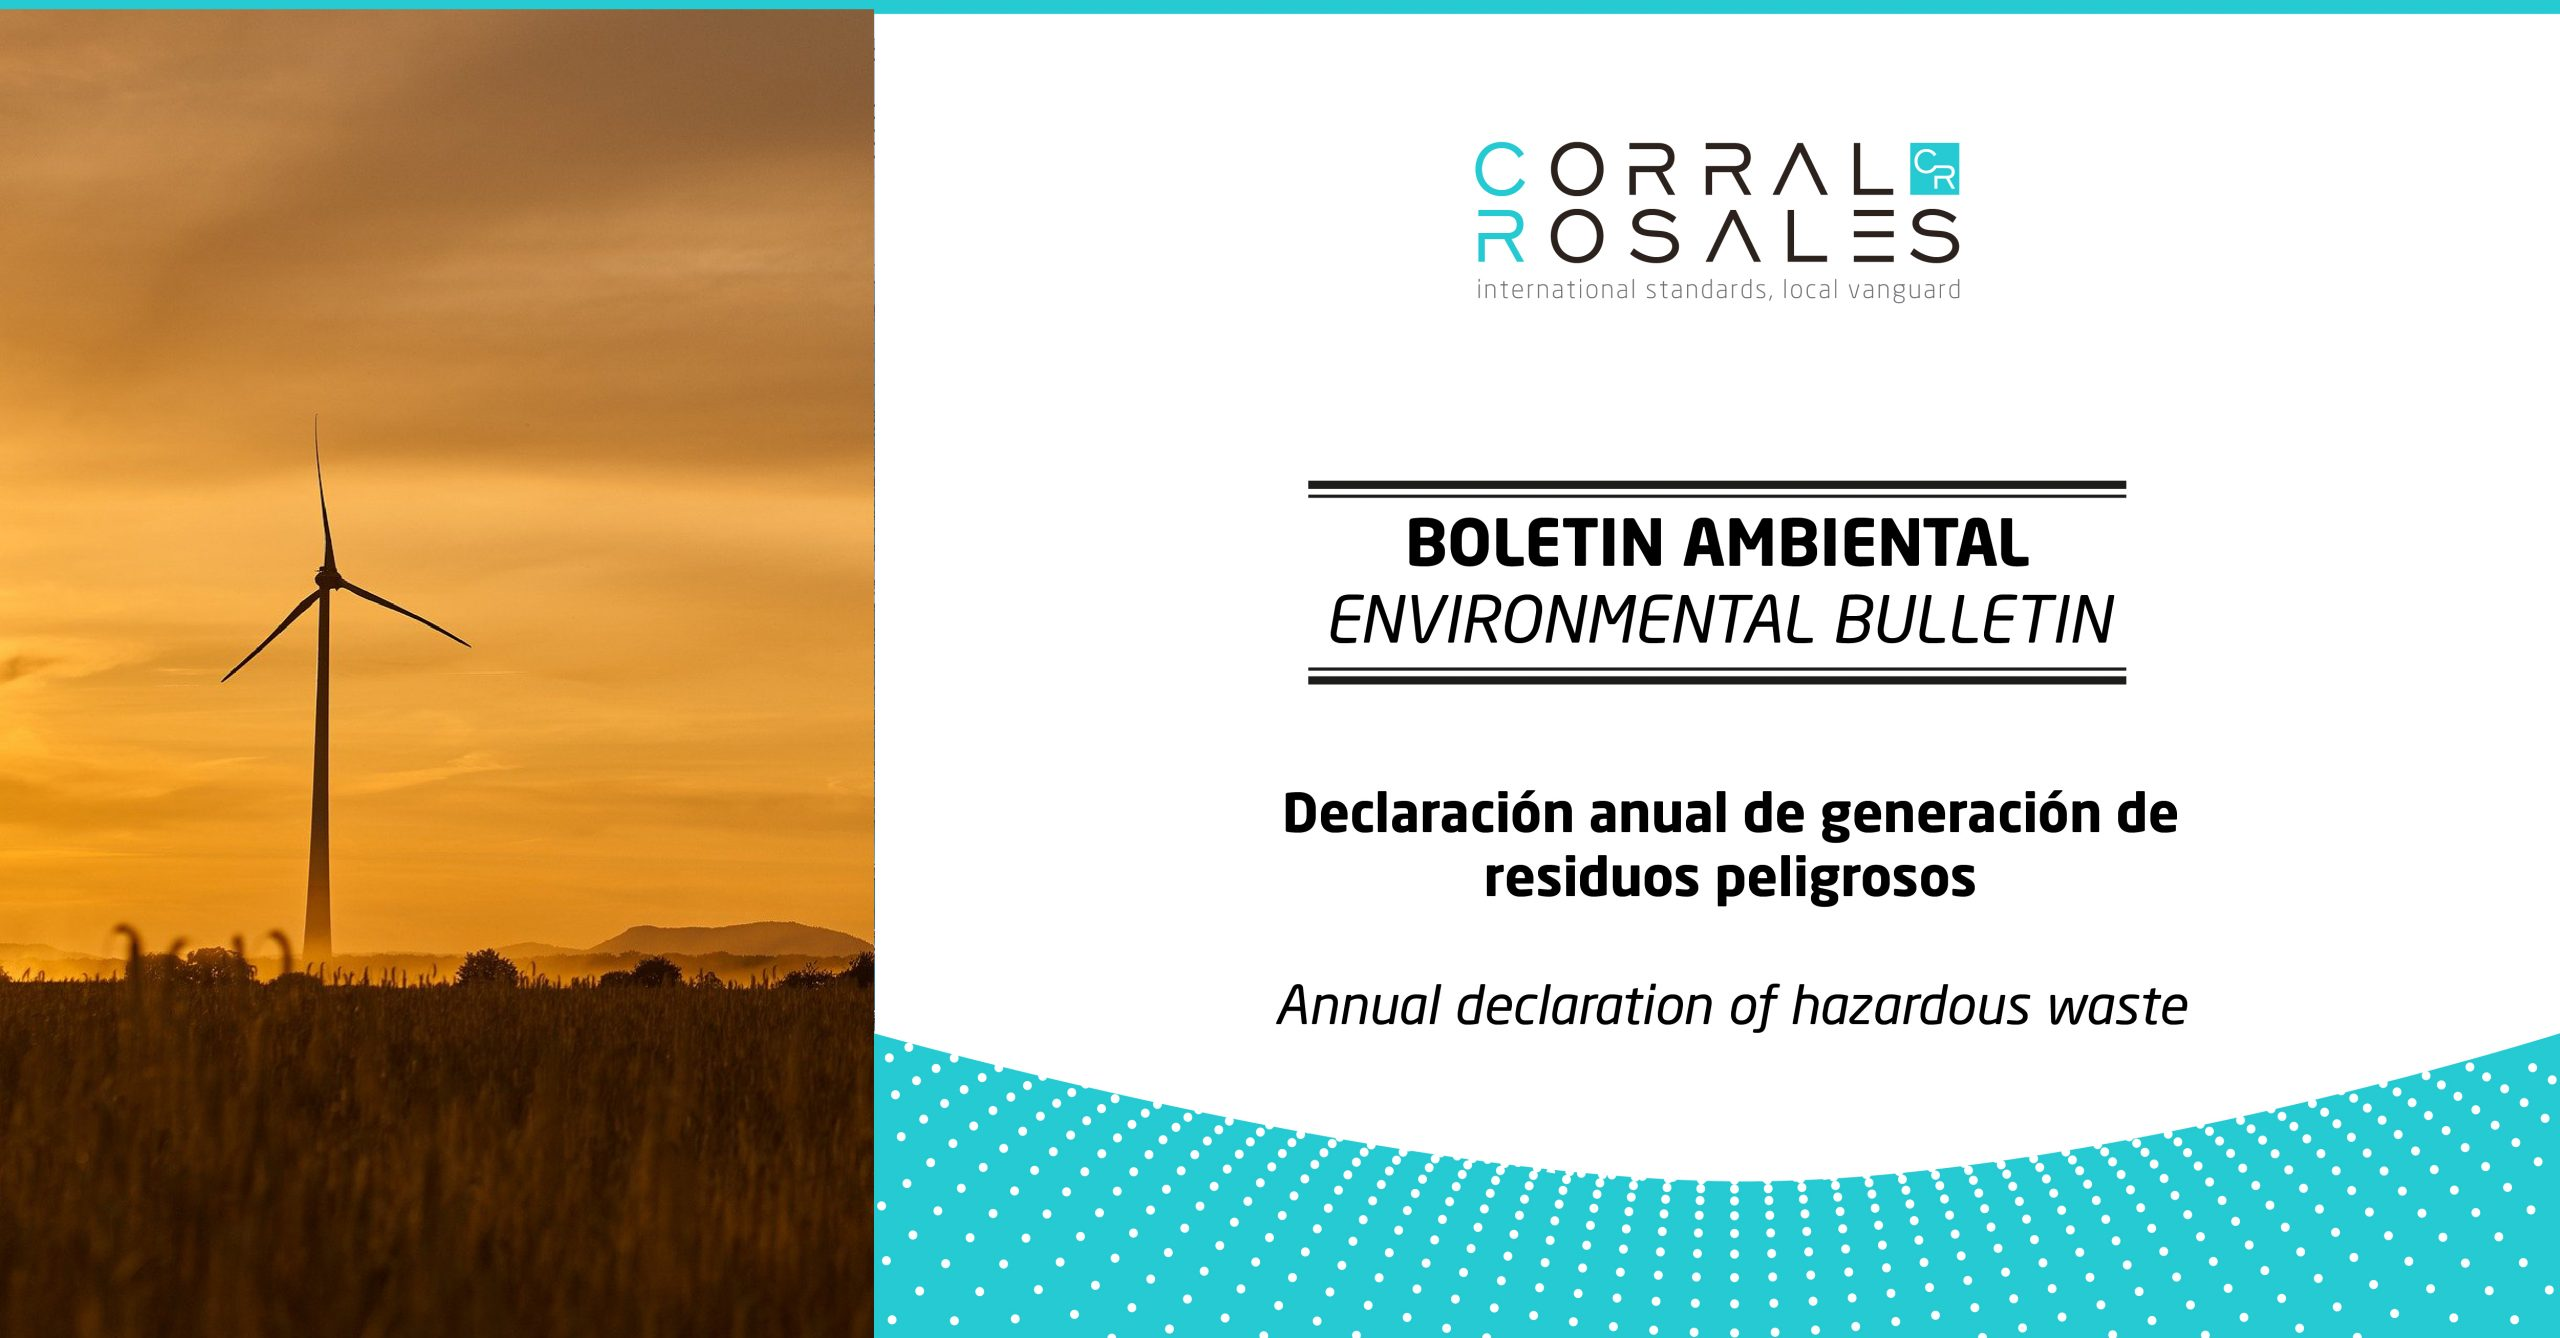 corral-rosales-abogados-ecuador-declaracion-anual-de-generacion-de-residuos-peligrosos